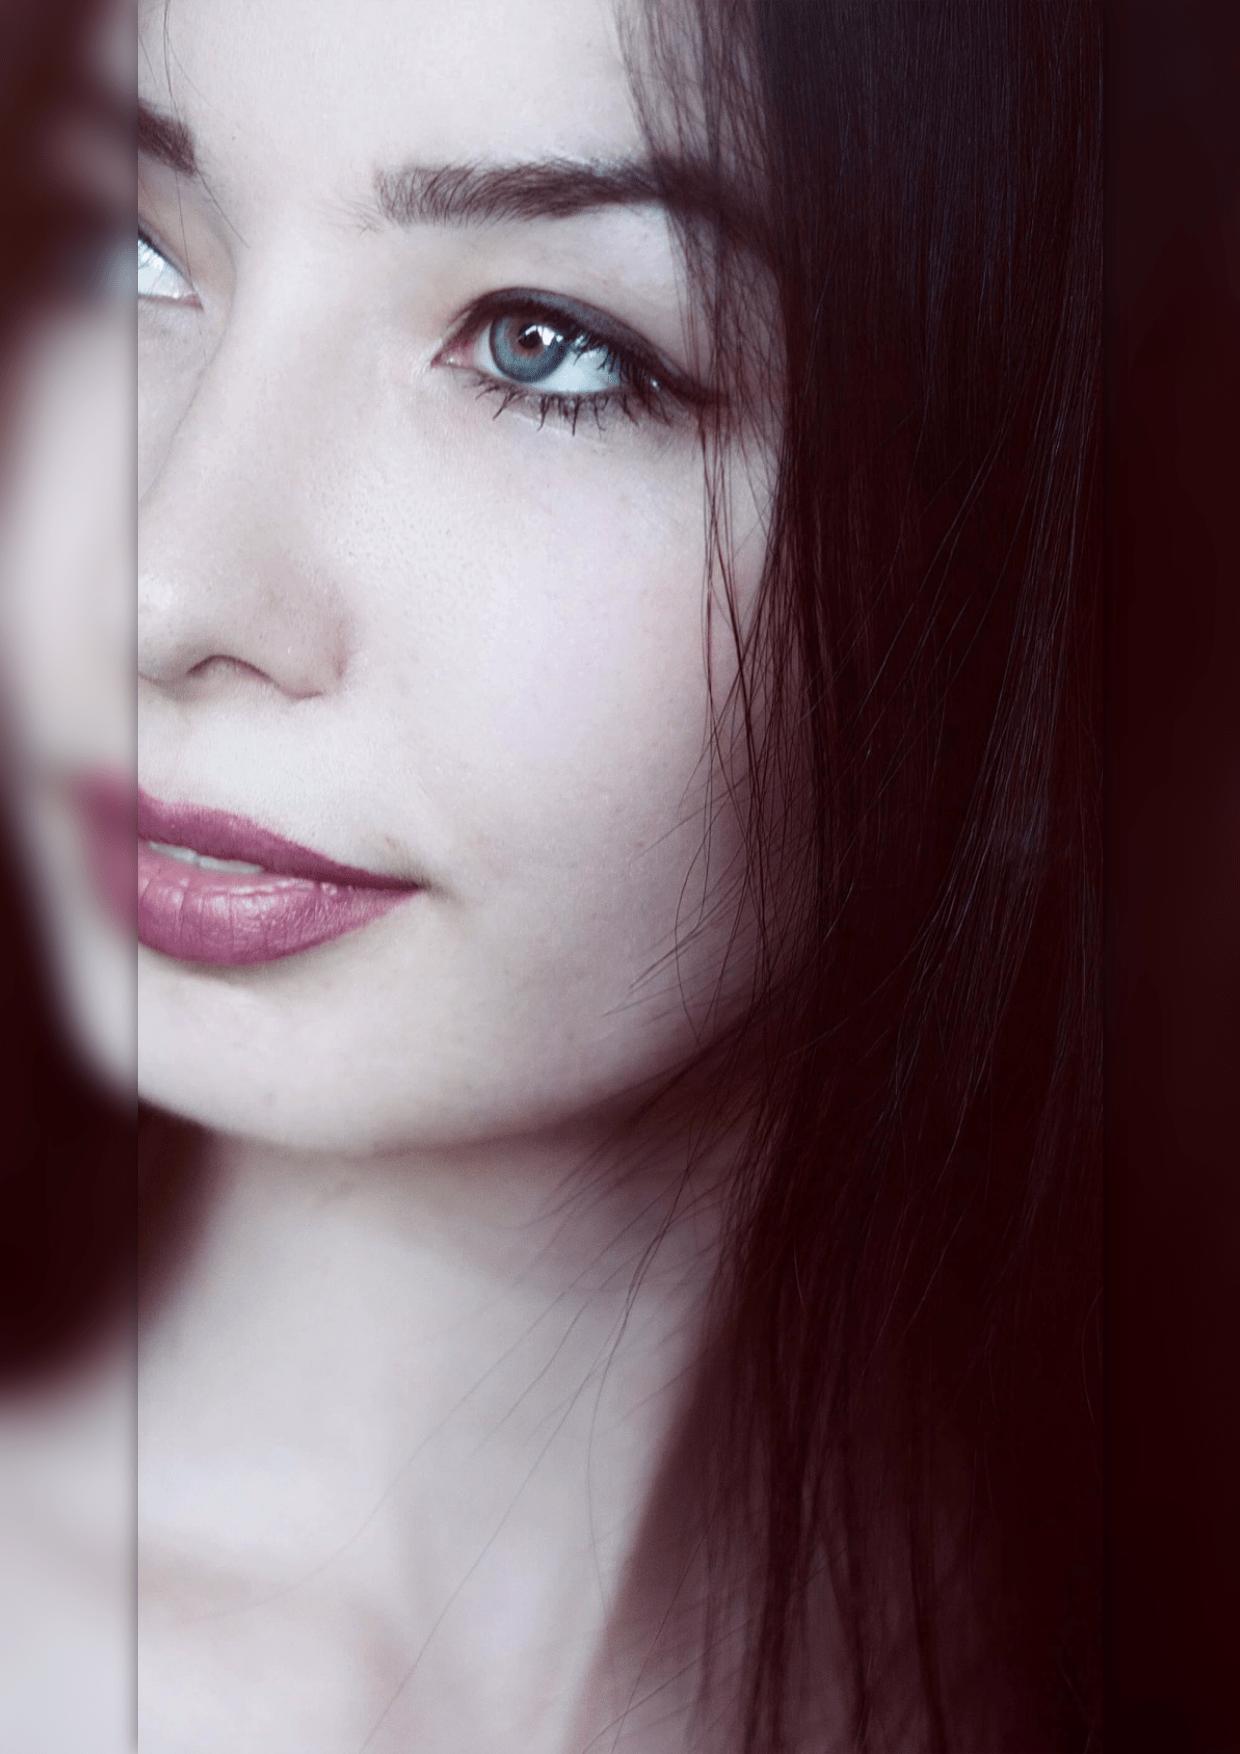 Face,                Hair,                Eyebrow,                Red,                Nose,                Image,                Avatar,                White,                Black,                 Free Image